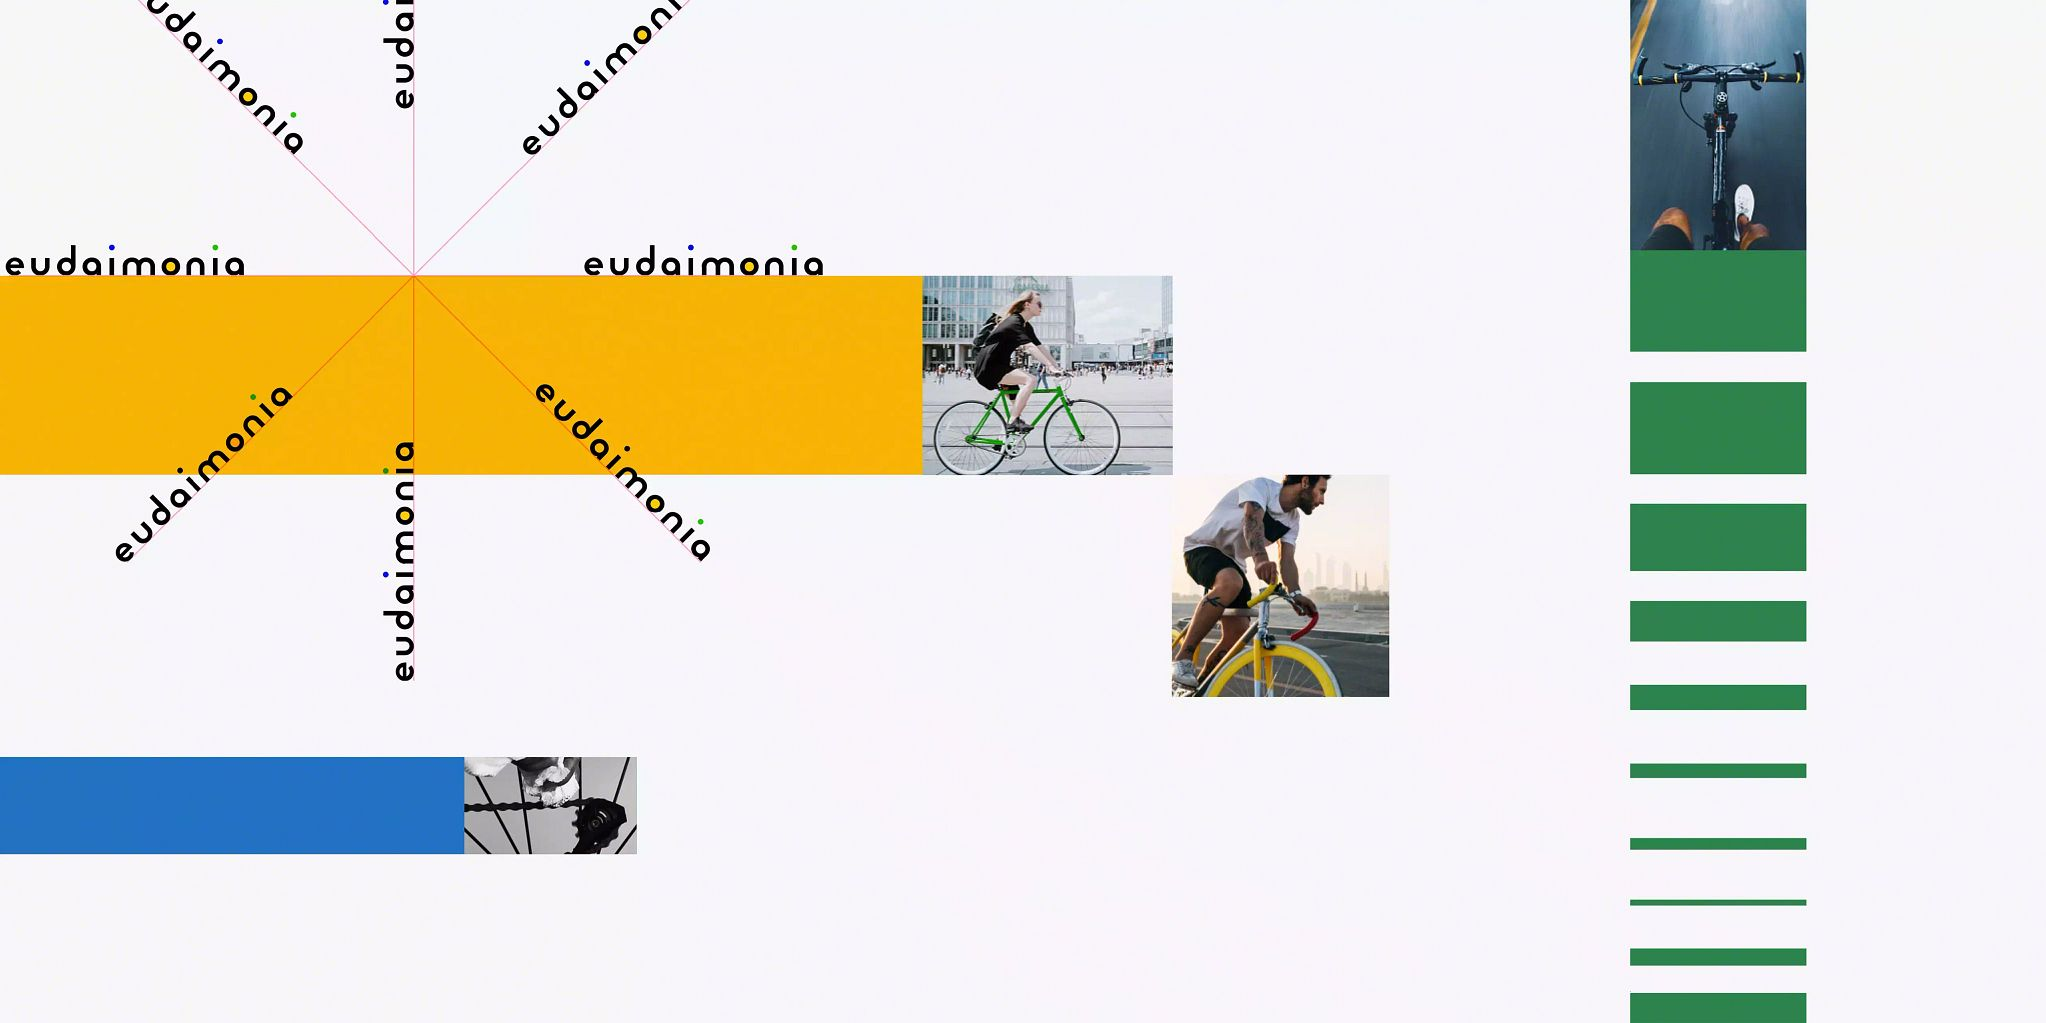 Photos of people on bikes.